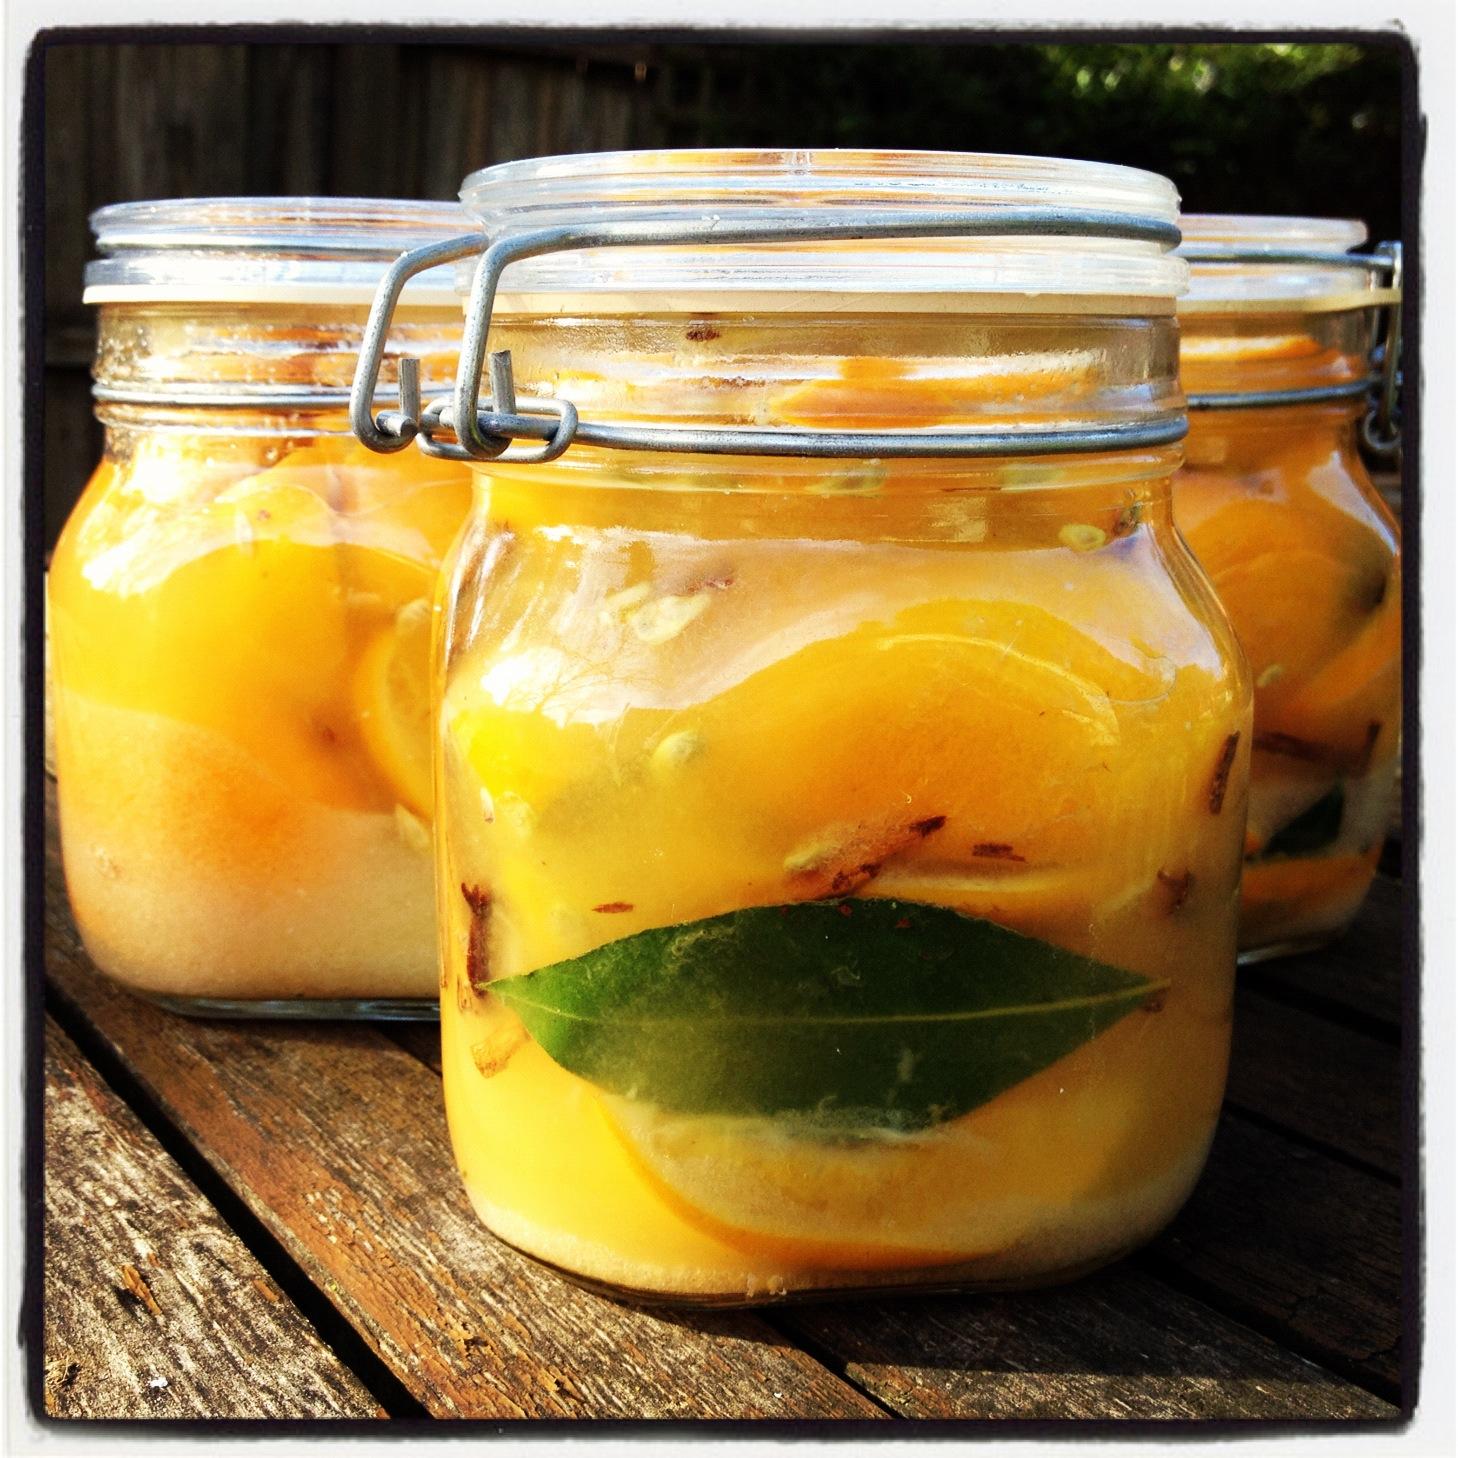 preserved lemons | The Practical Mystic